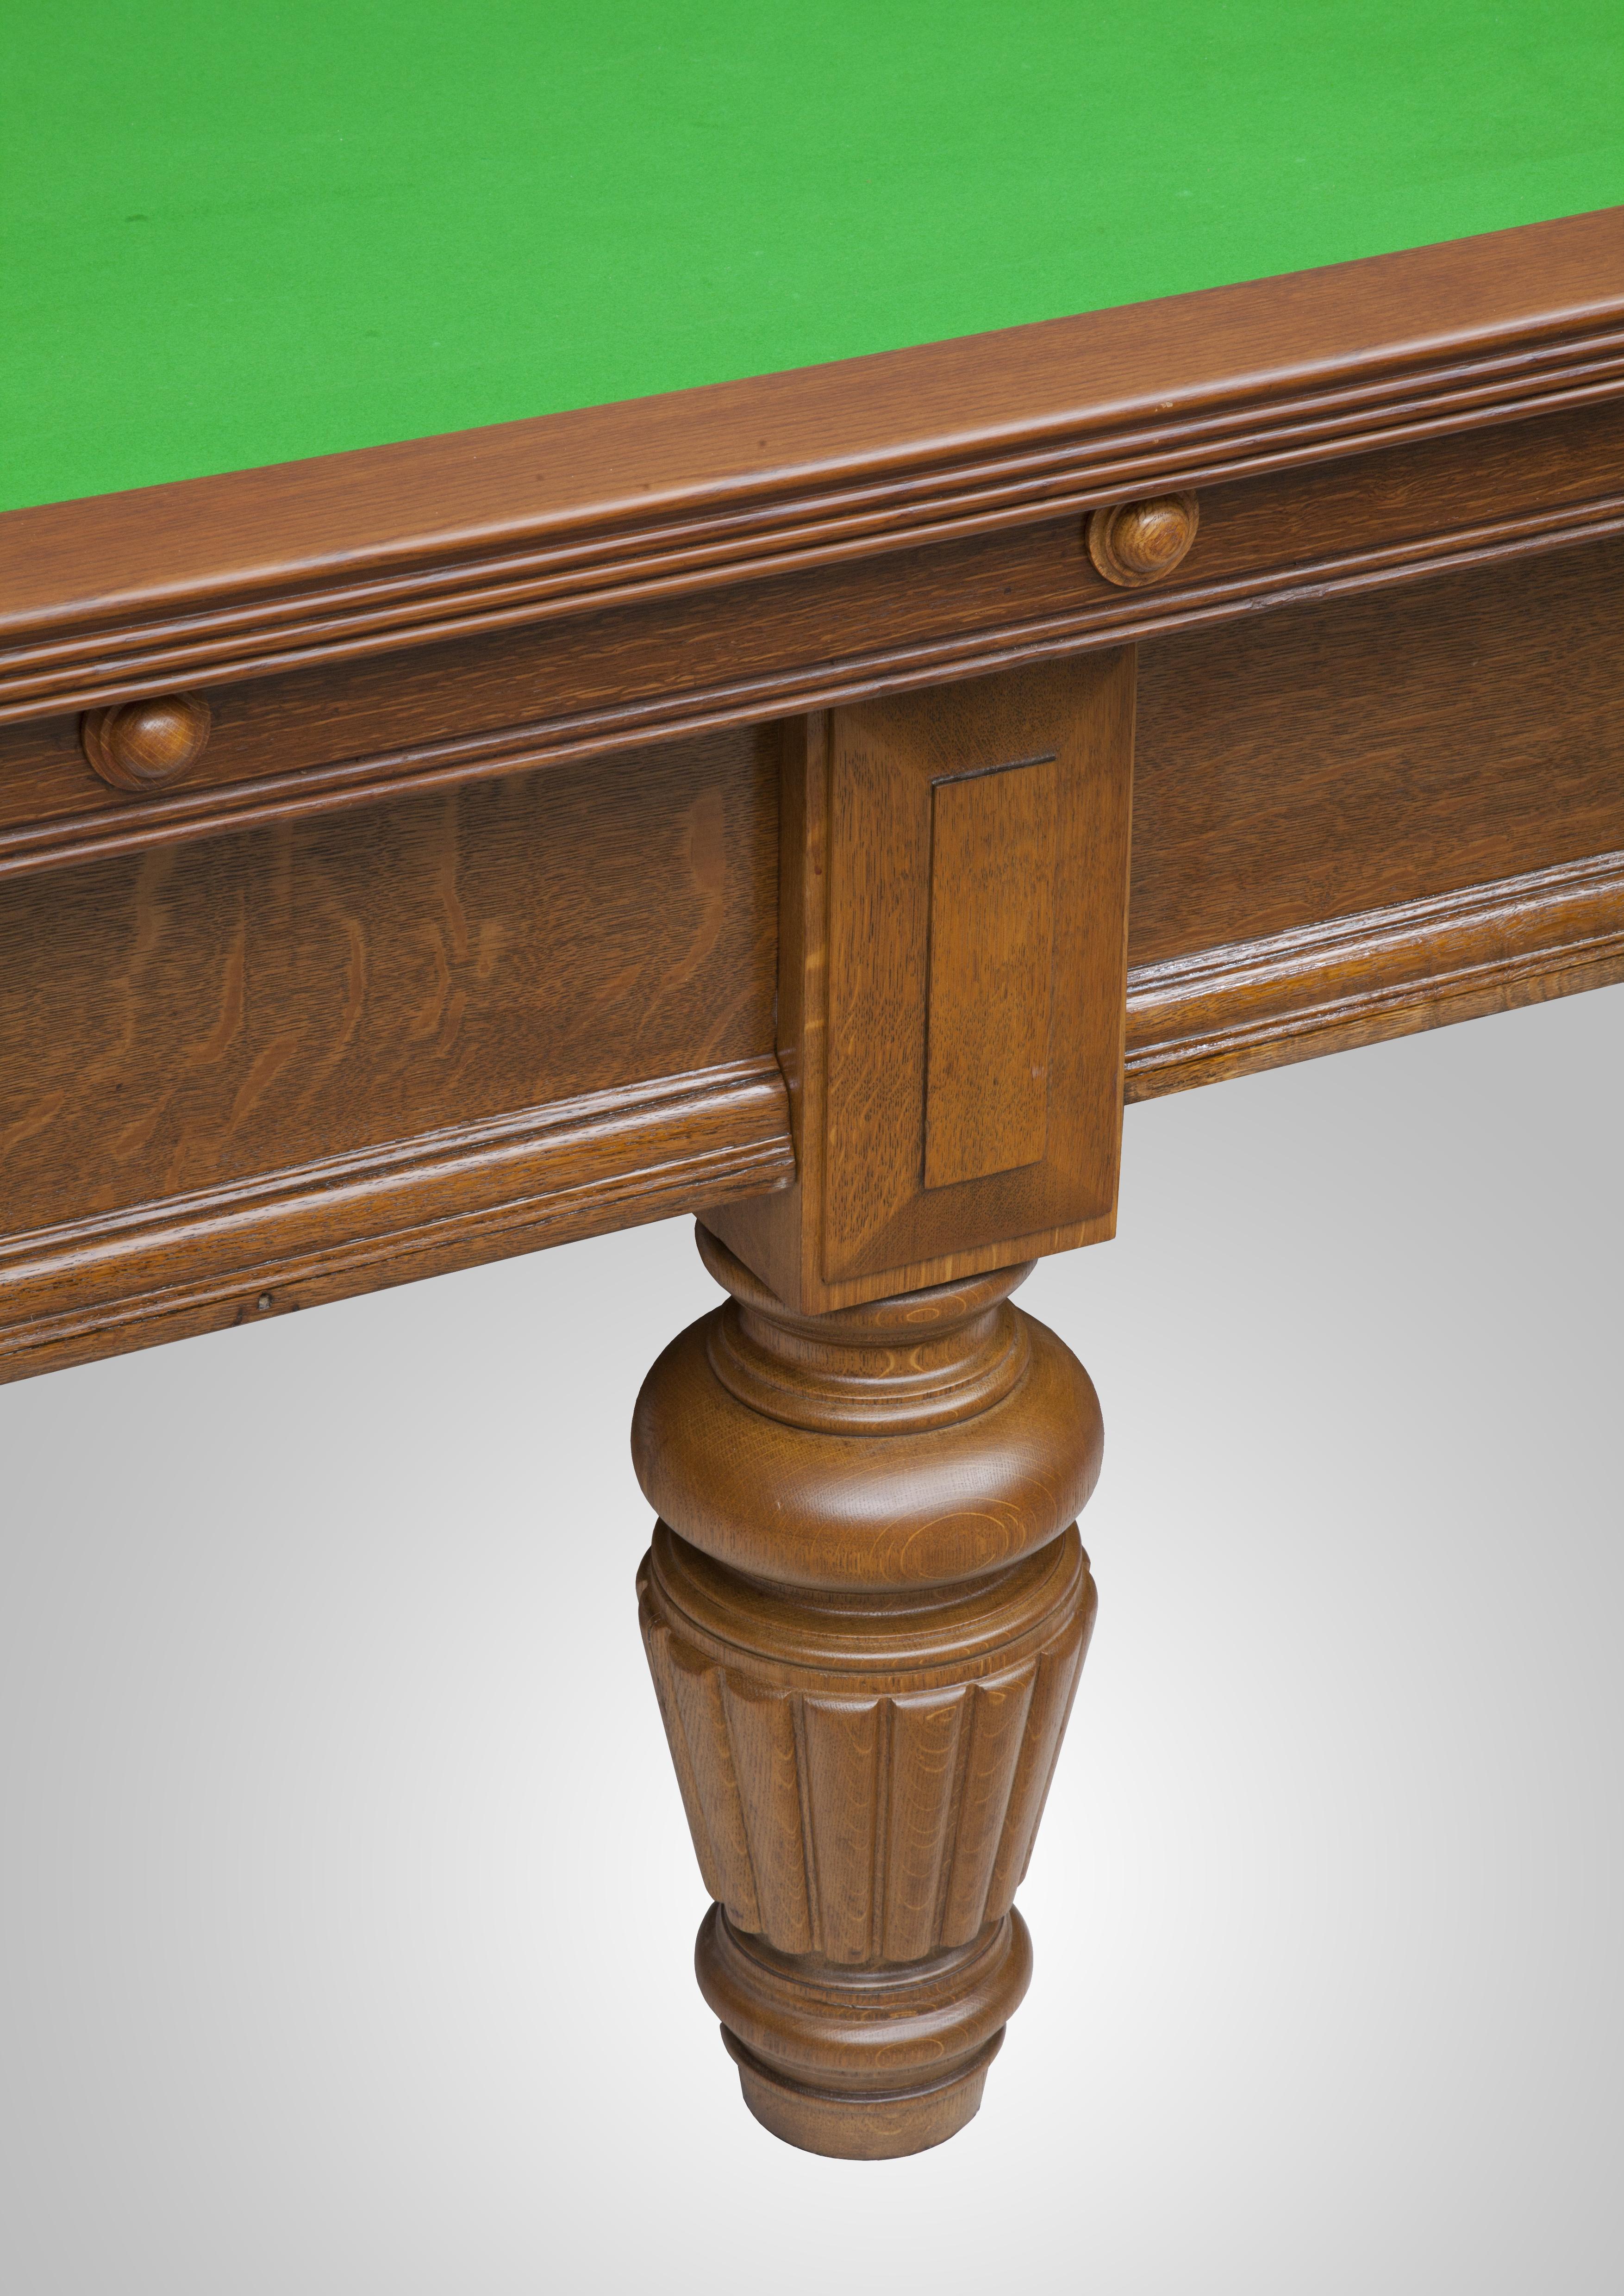 Burroughs amp Watts Restored antique oak Snooker Table : Antique table 22 from www.alliancesnooker.co.uk size 3508 x 4961 jpeg 8198kB